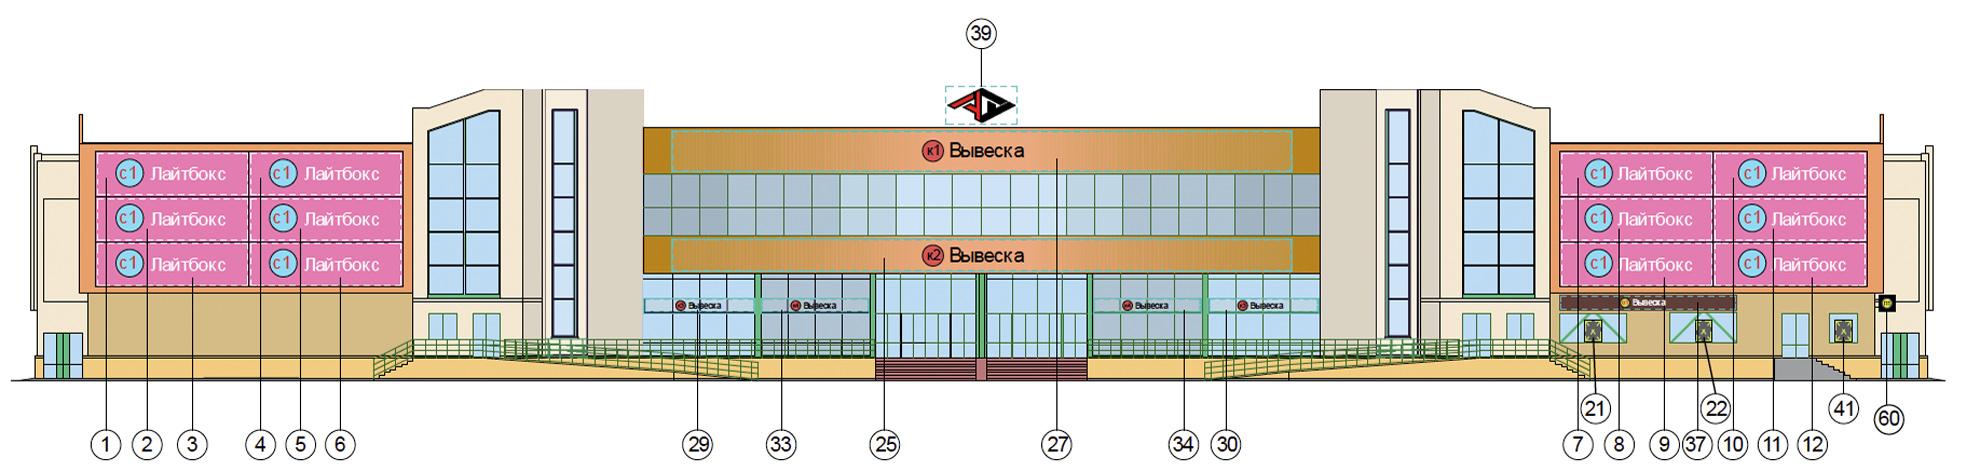 Soglasovanie-raklama-na-torgovom-centre